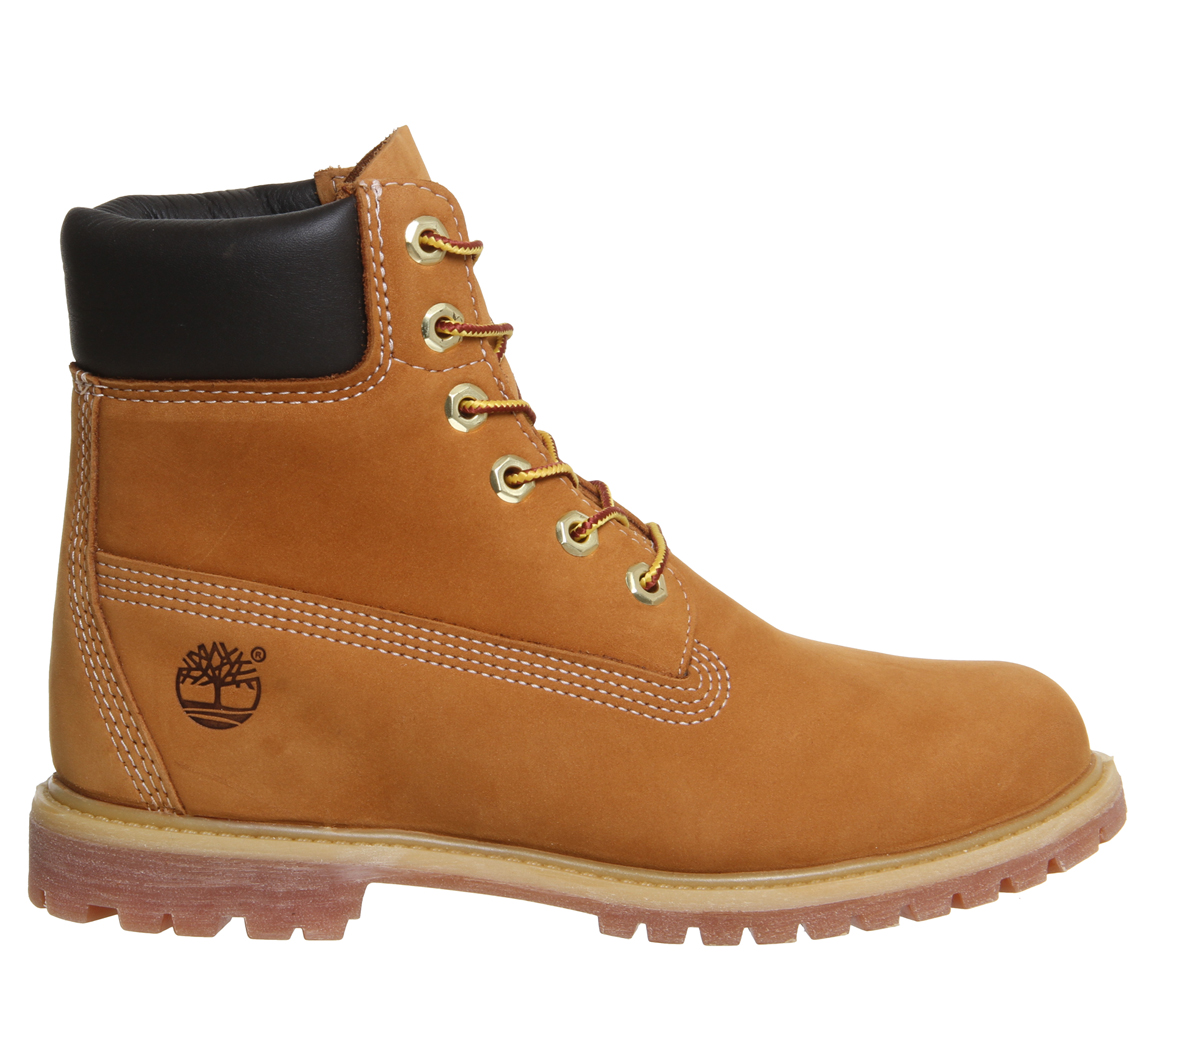 SENTINEL Donna Timberland Premium 6 Stivali FRUMENTO Boots NUBUCK d5557817fa7